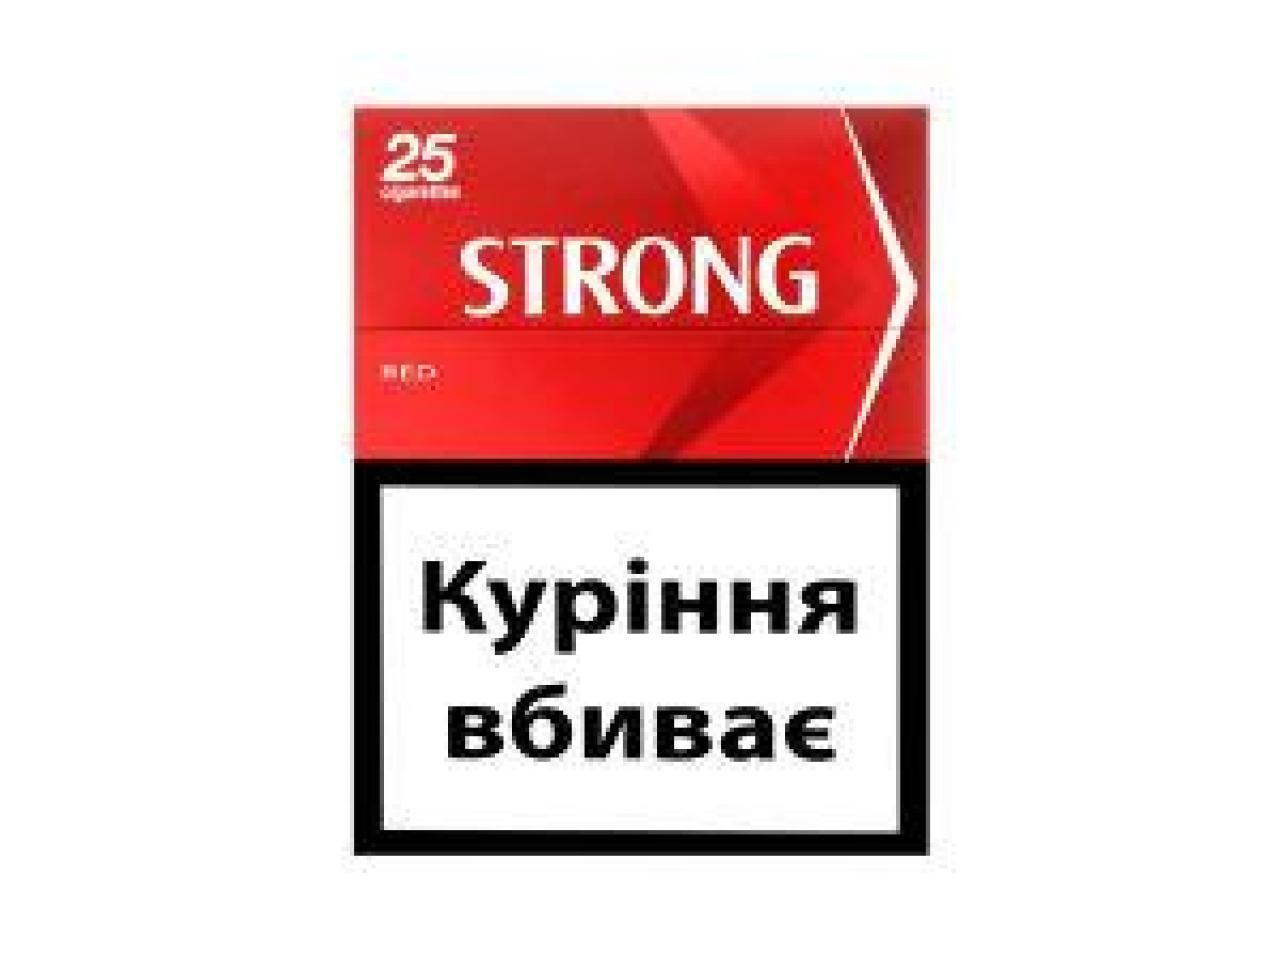 Сигареты Strong - 2